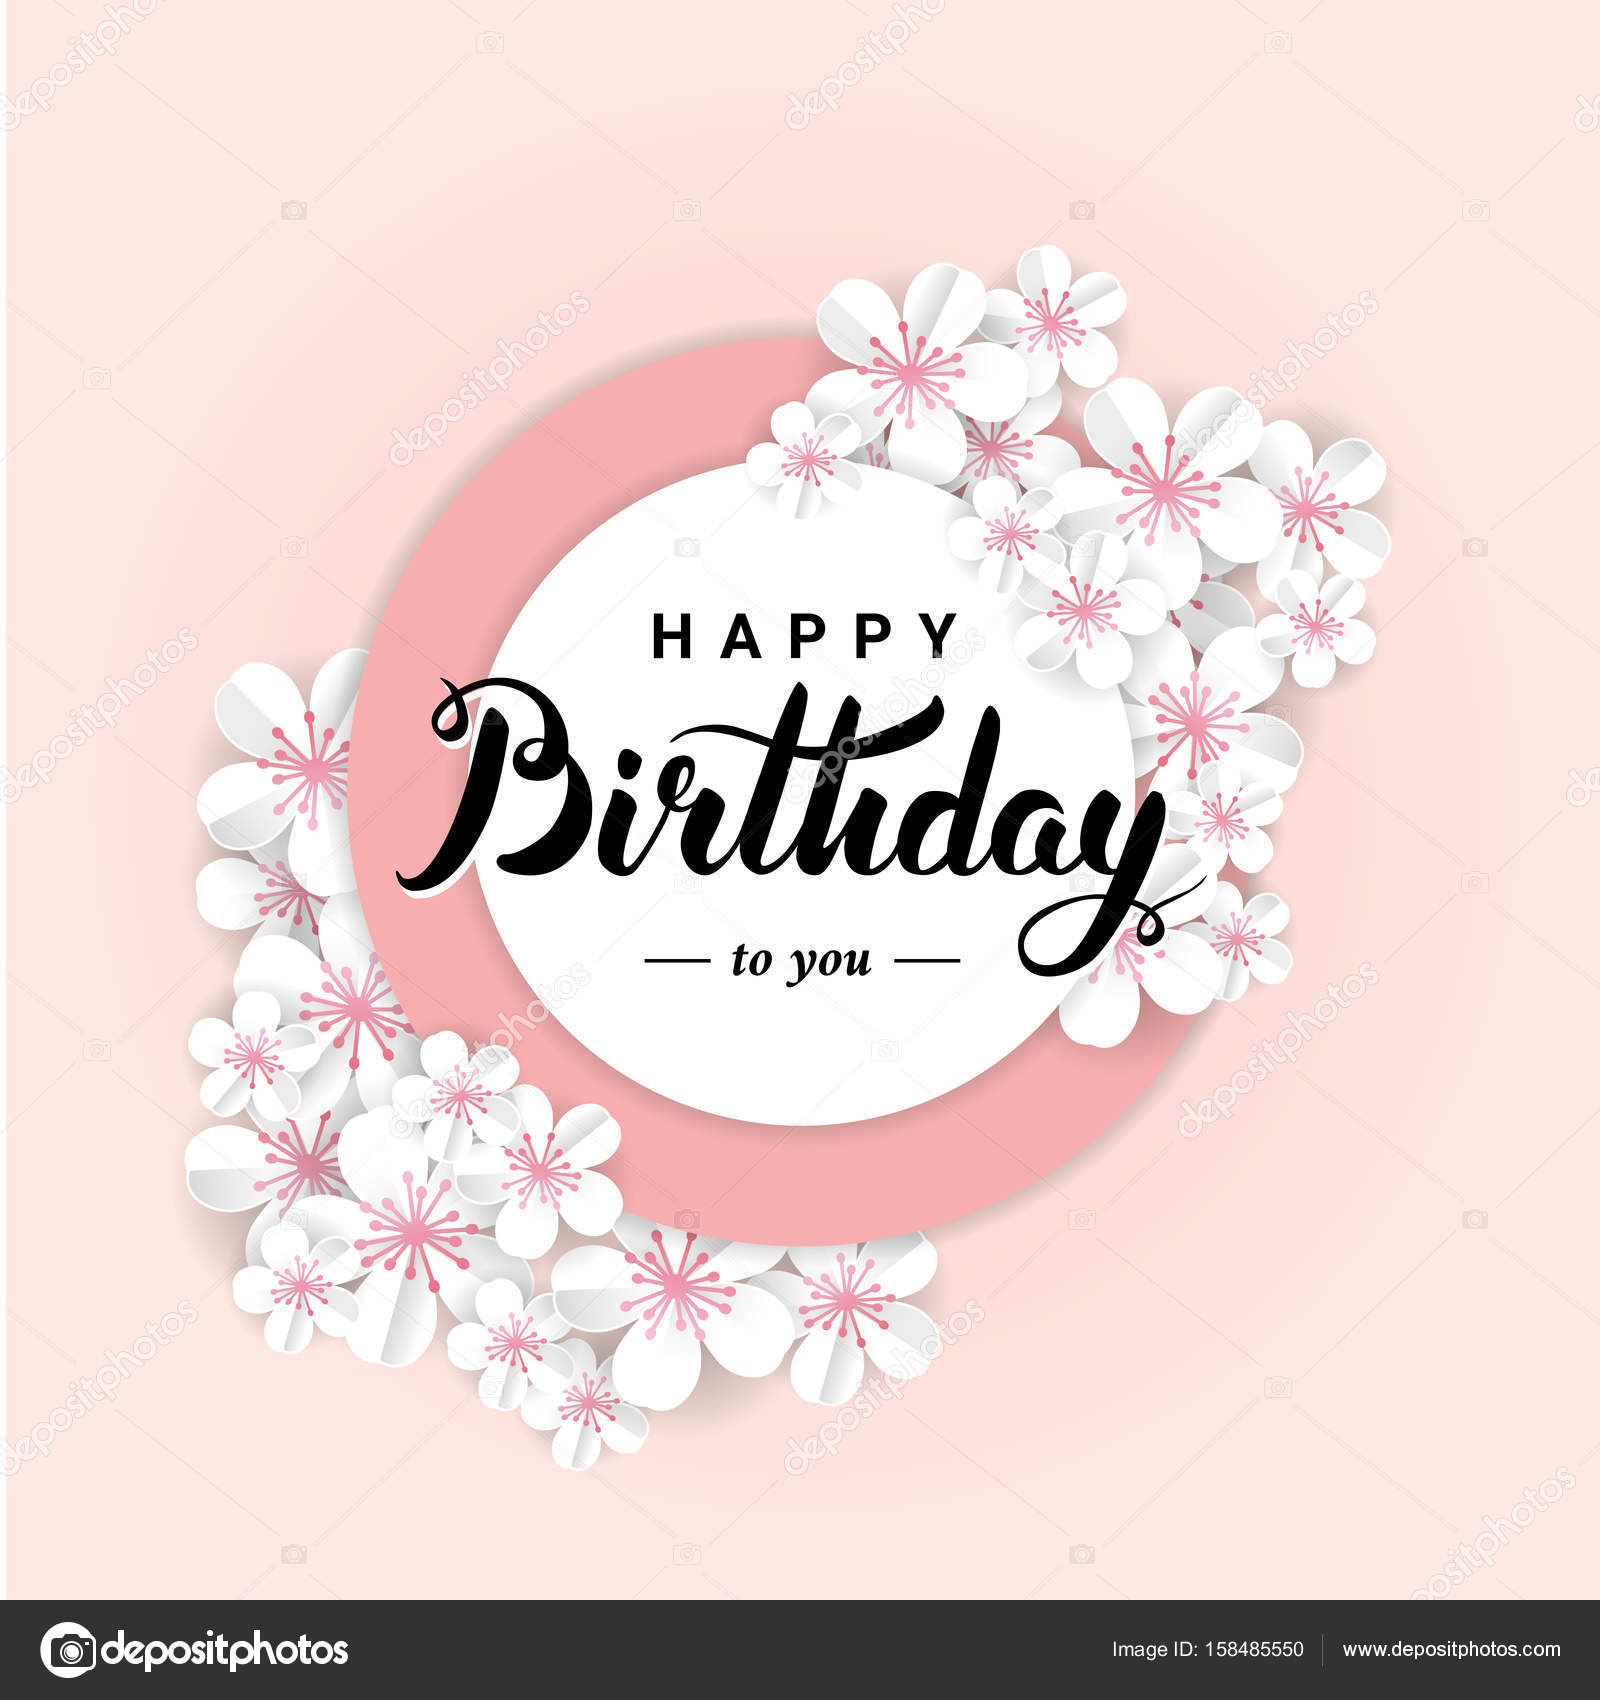 Happy birthday sakura flower stock photo pirinairina 158485550 happy birthday sakura flower stock photo izmirmasajfo Image collections